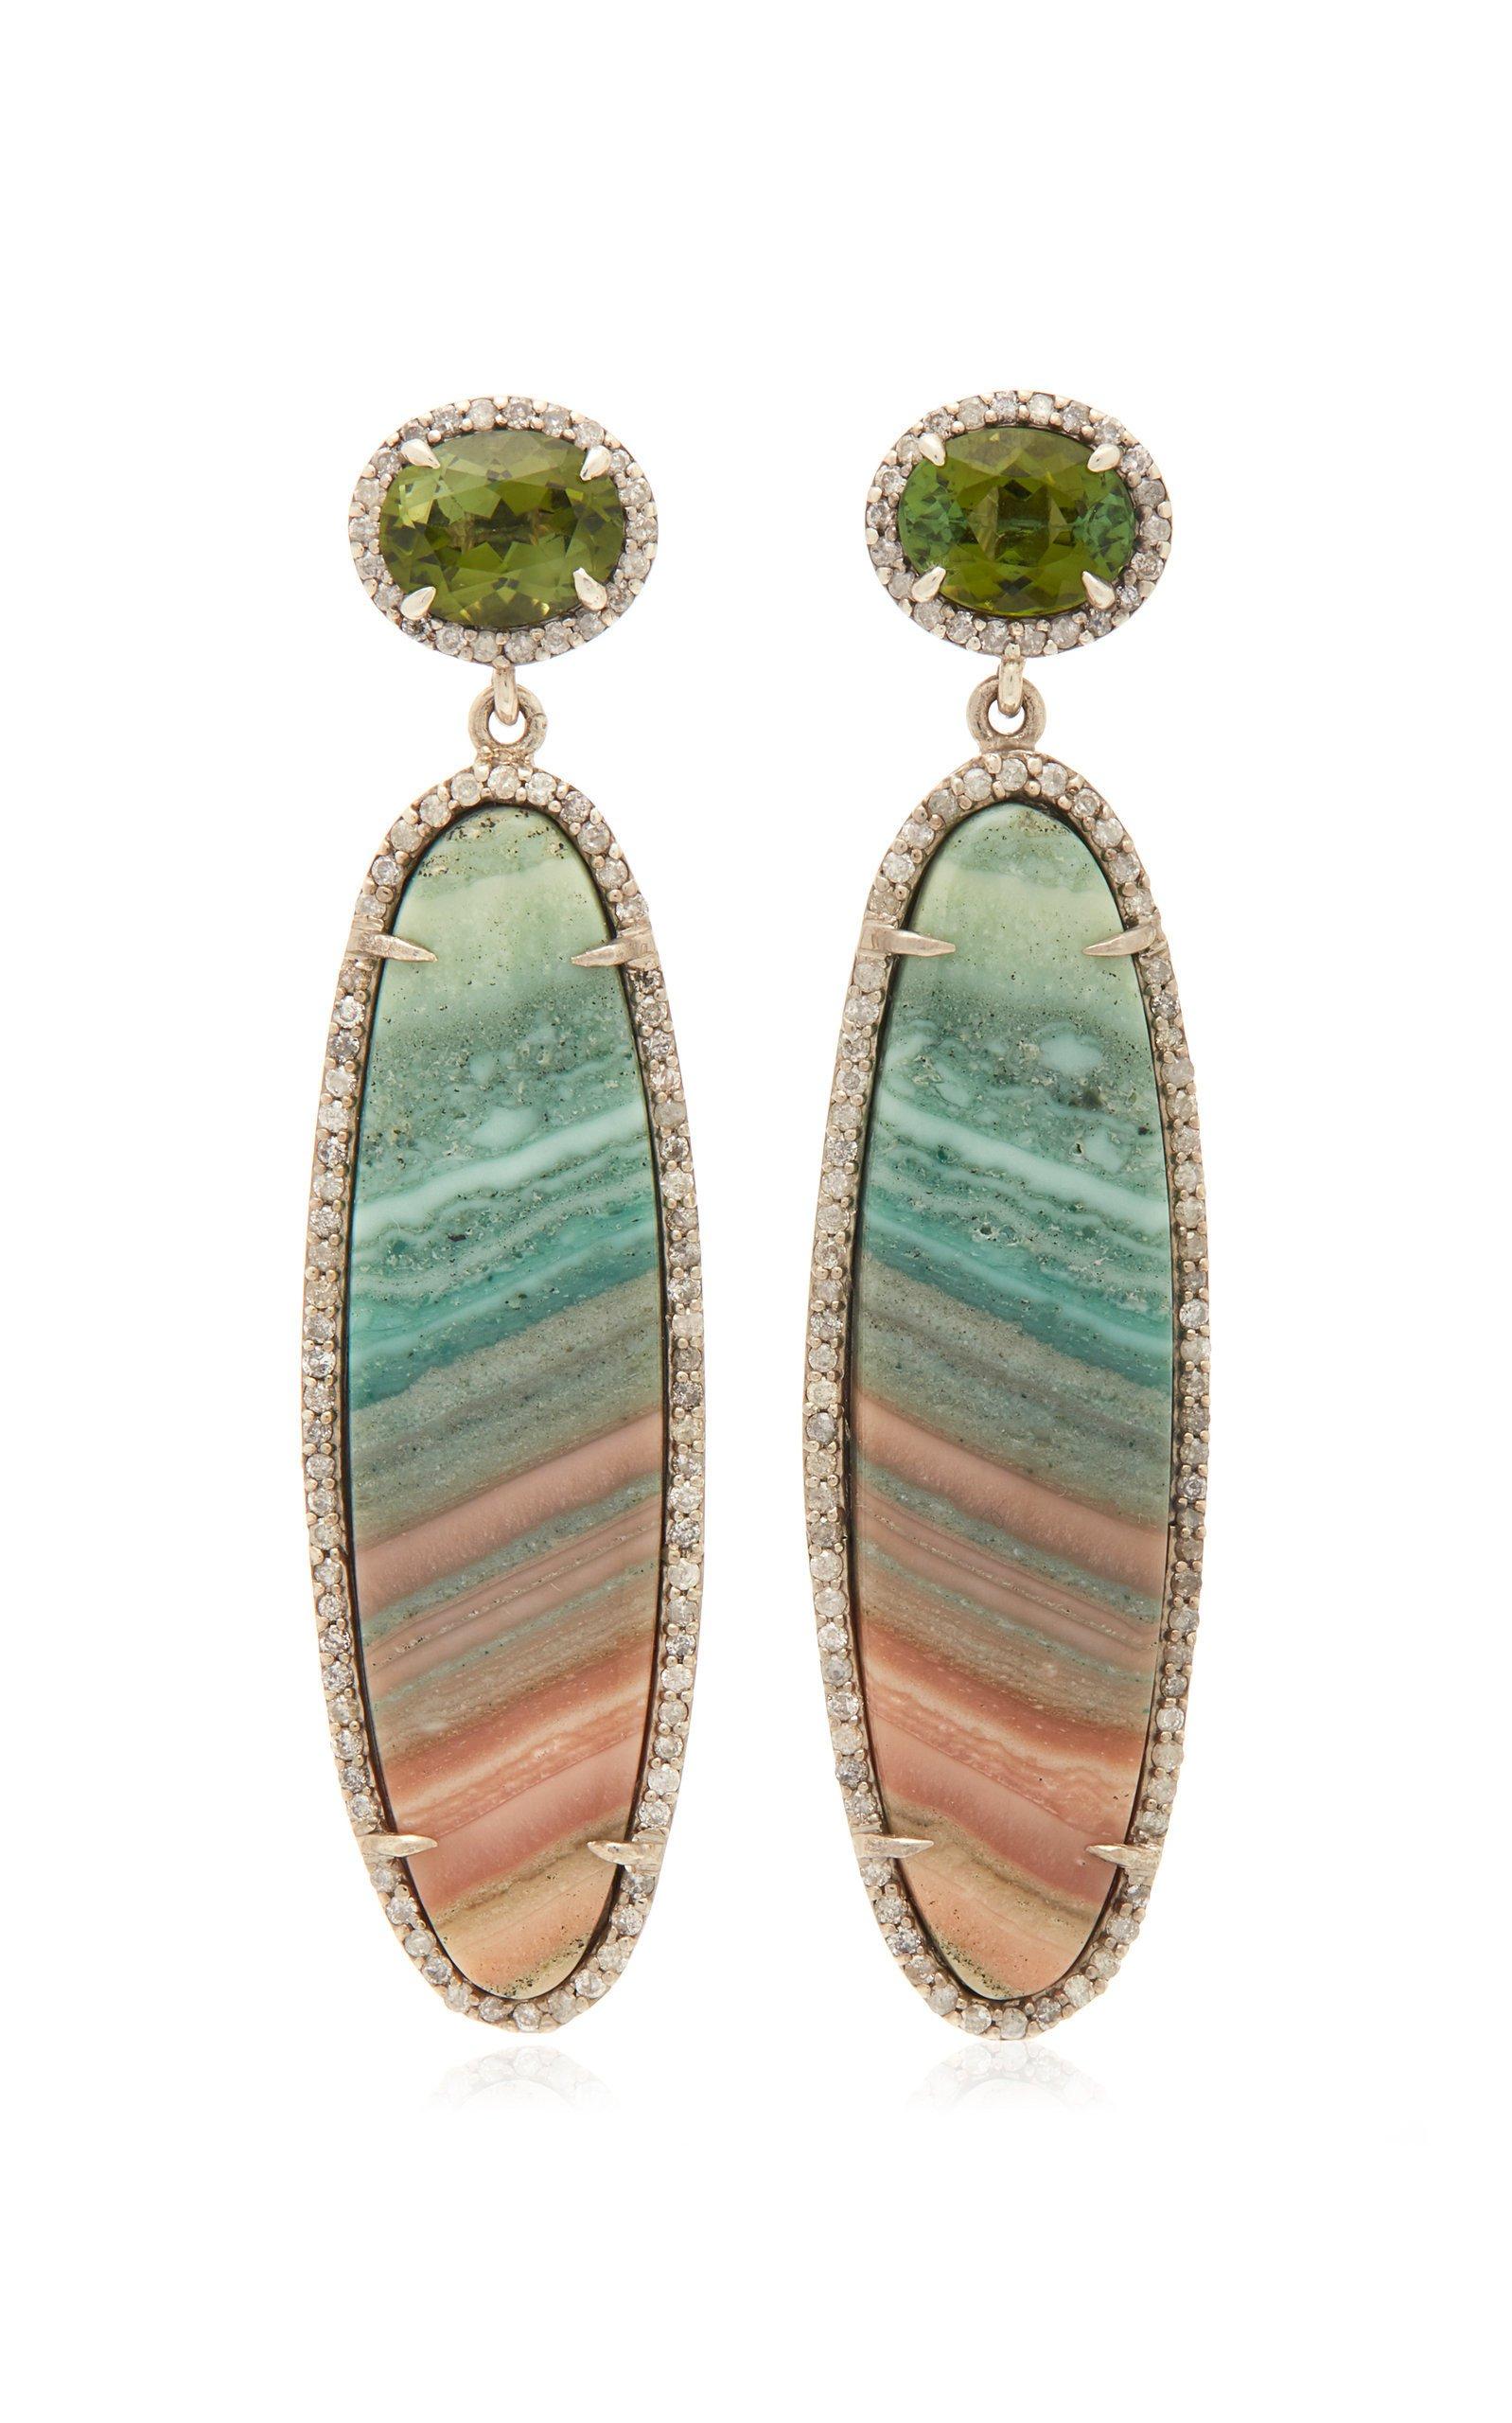 Sheryl Lowe Saturn Chalcedony And Green Tourmaline Drop Earrings